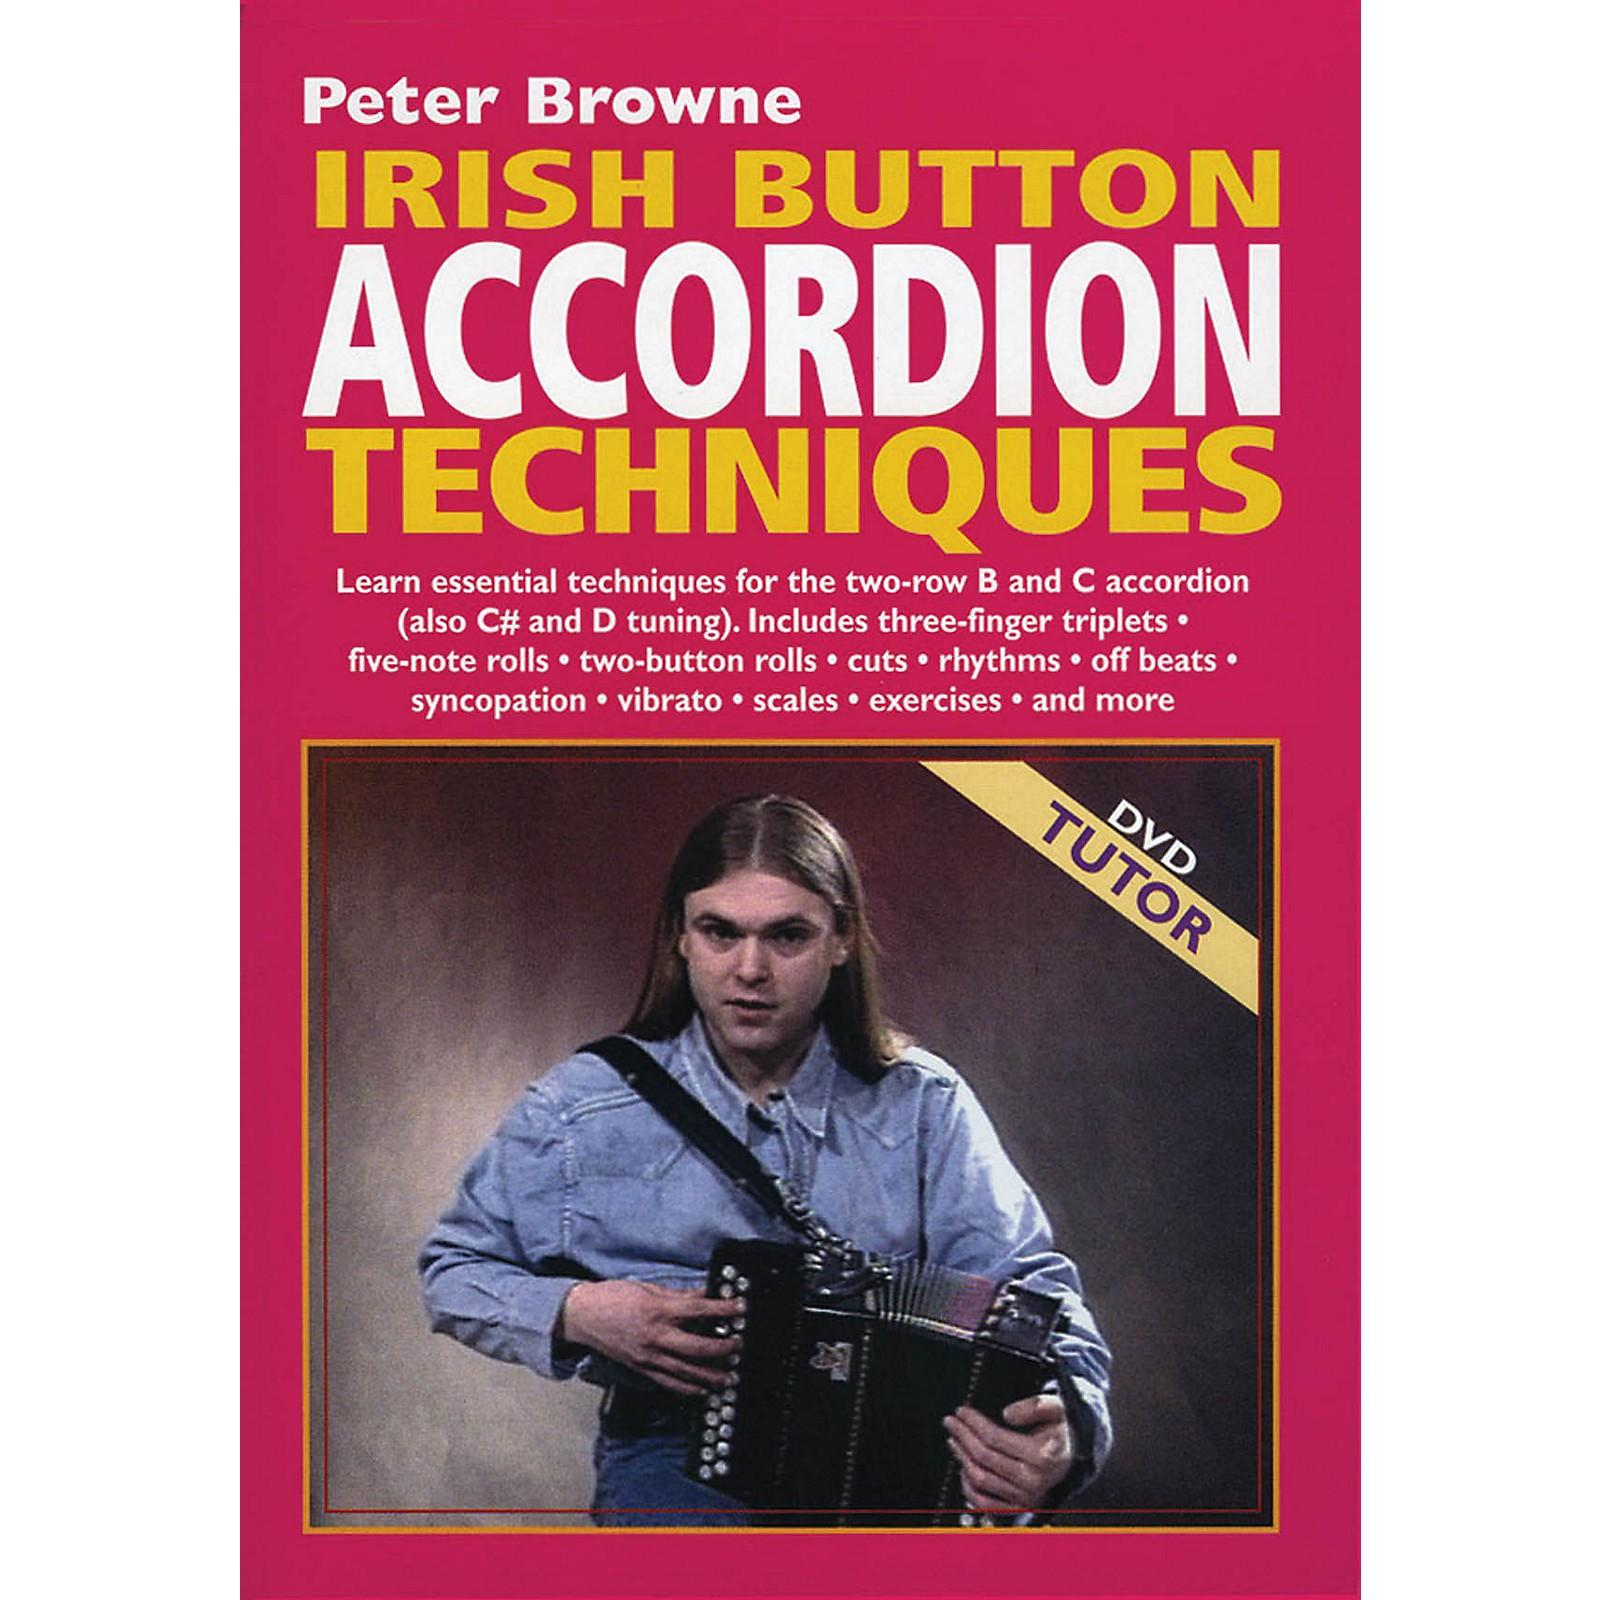 Waltons Irish Button Accordion Techniques Waltons Irish Music Dvd Series DVD Written by Peter Browne